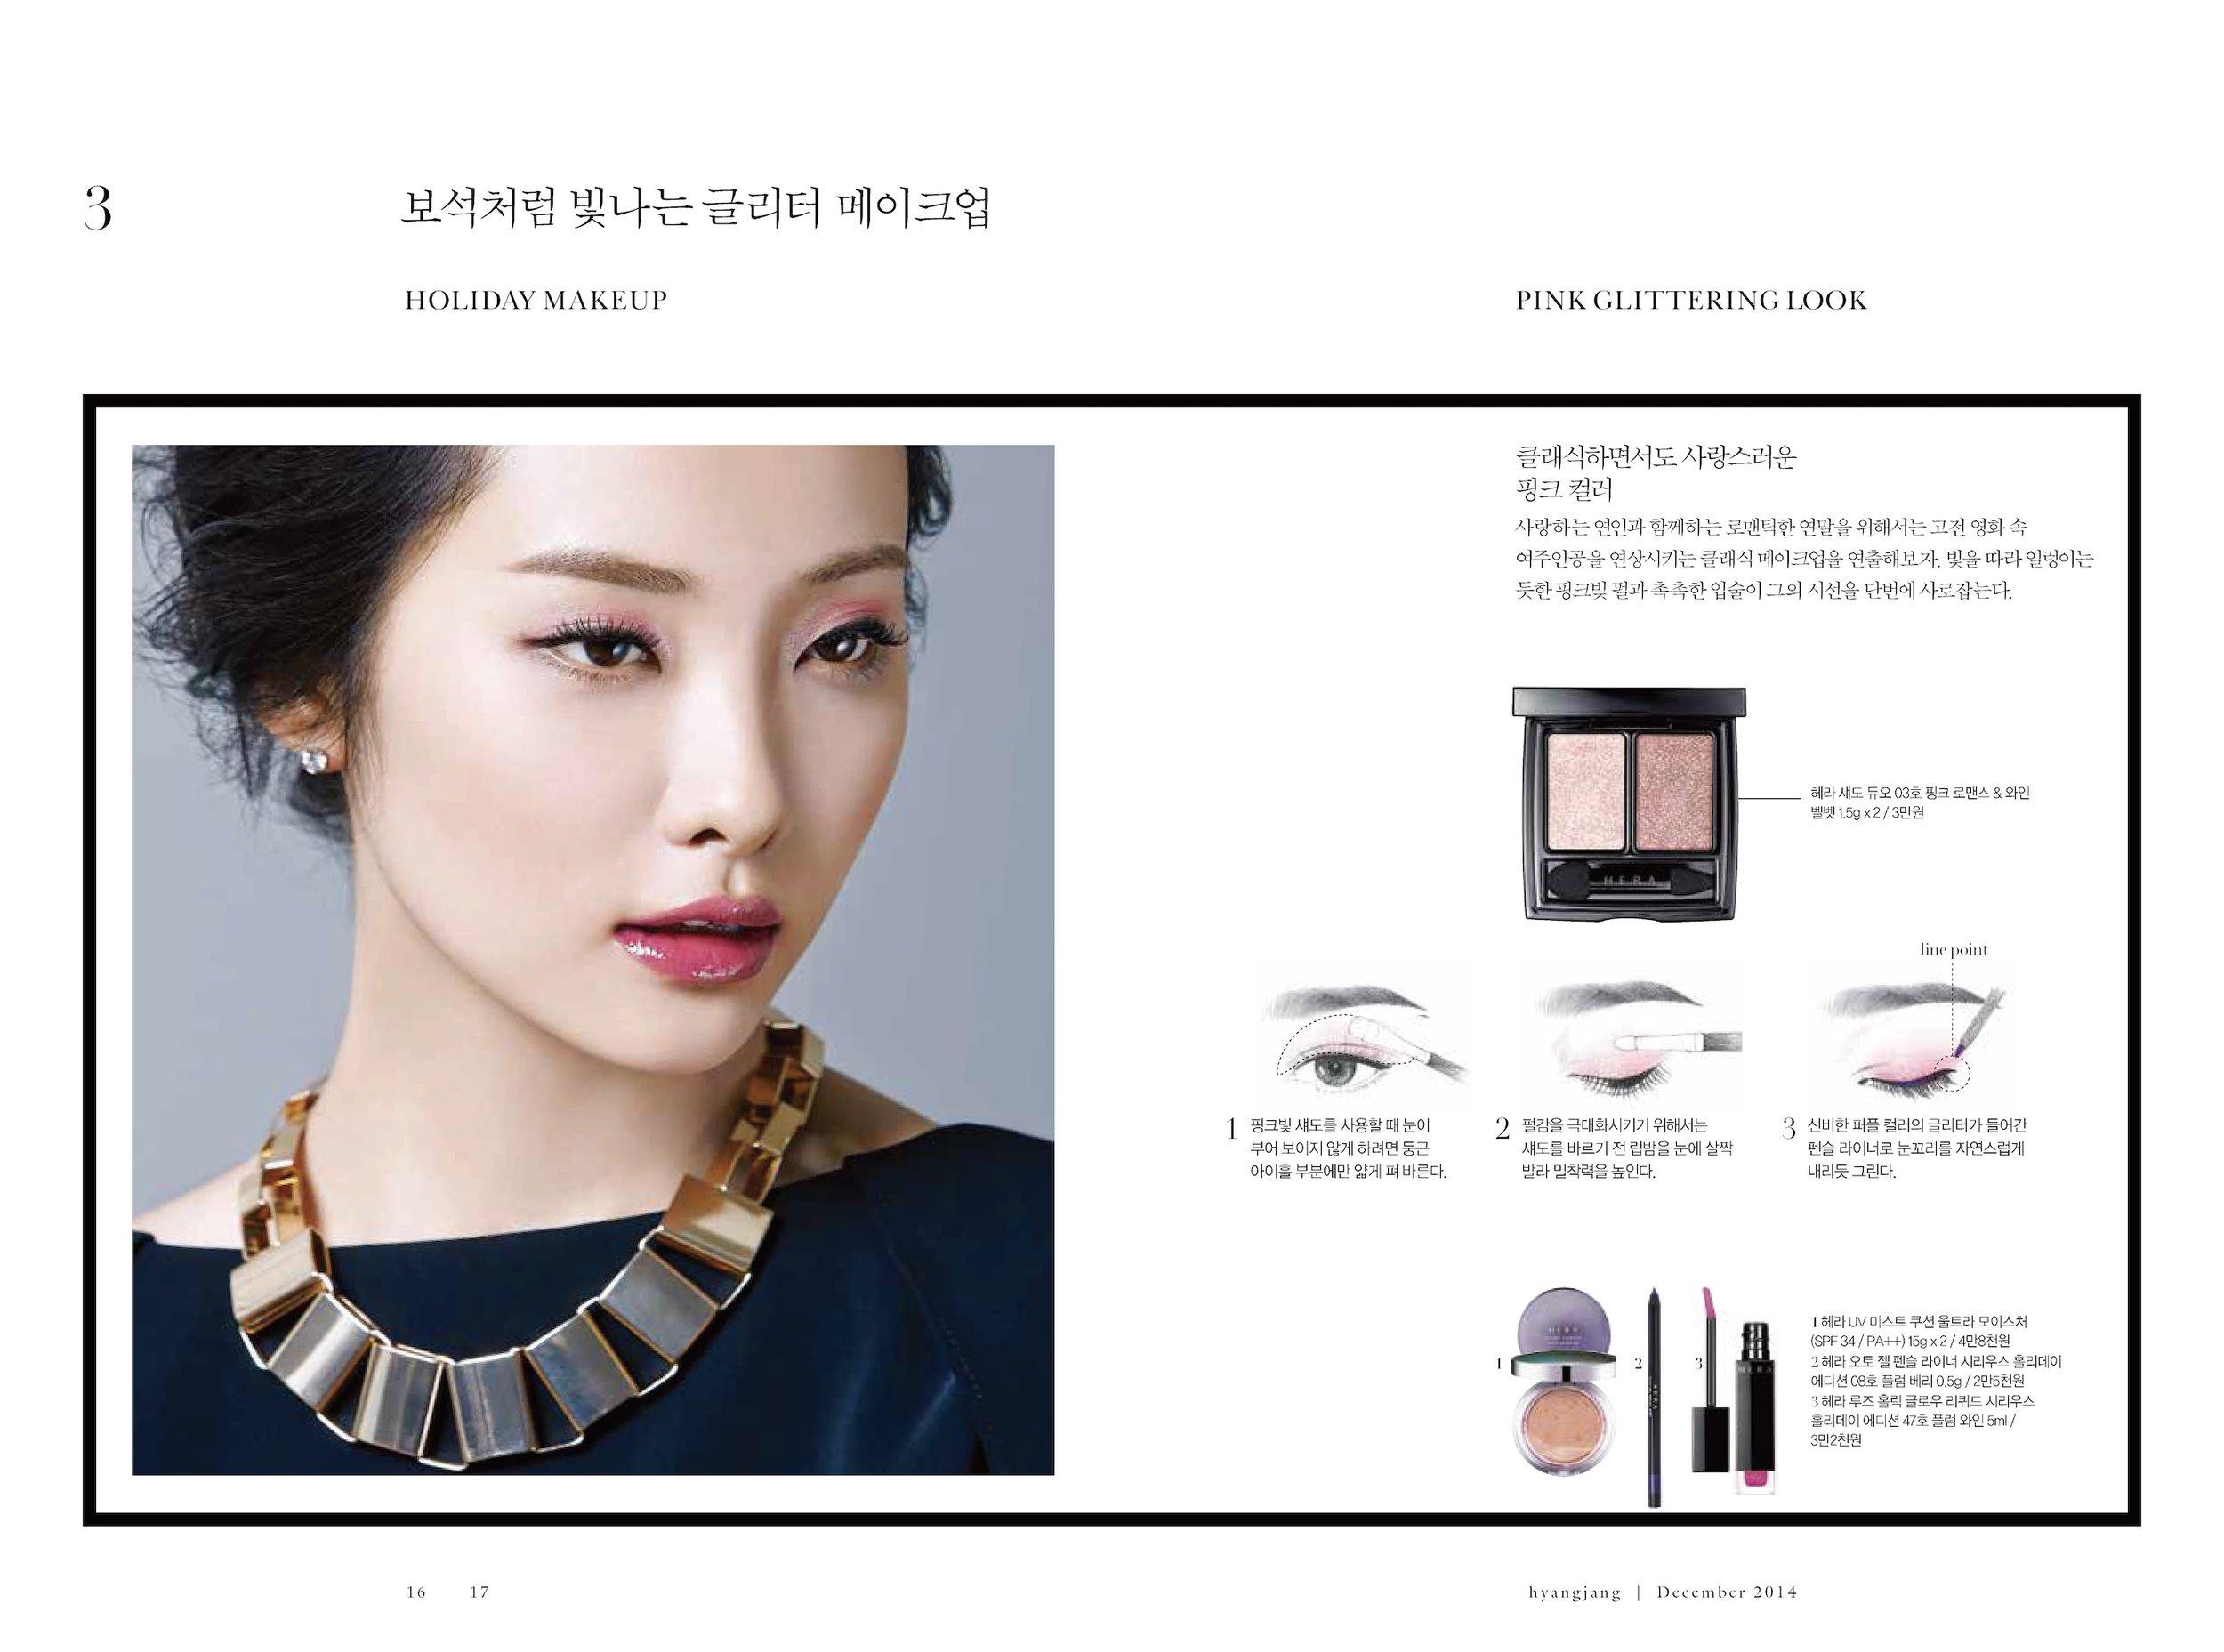 hyangjang-201412_페이지_10.jpeg